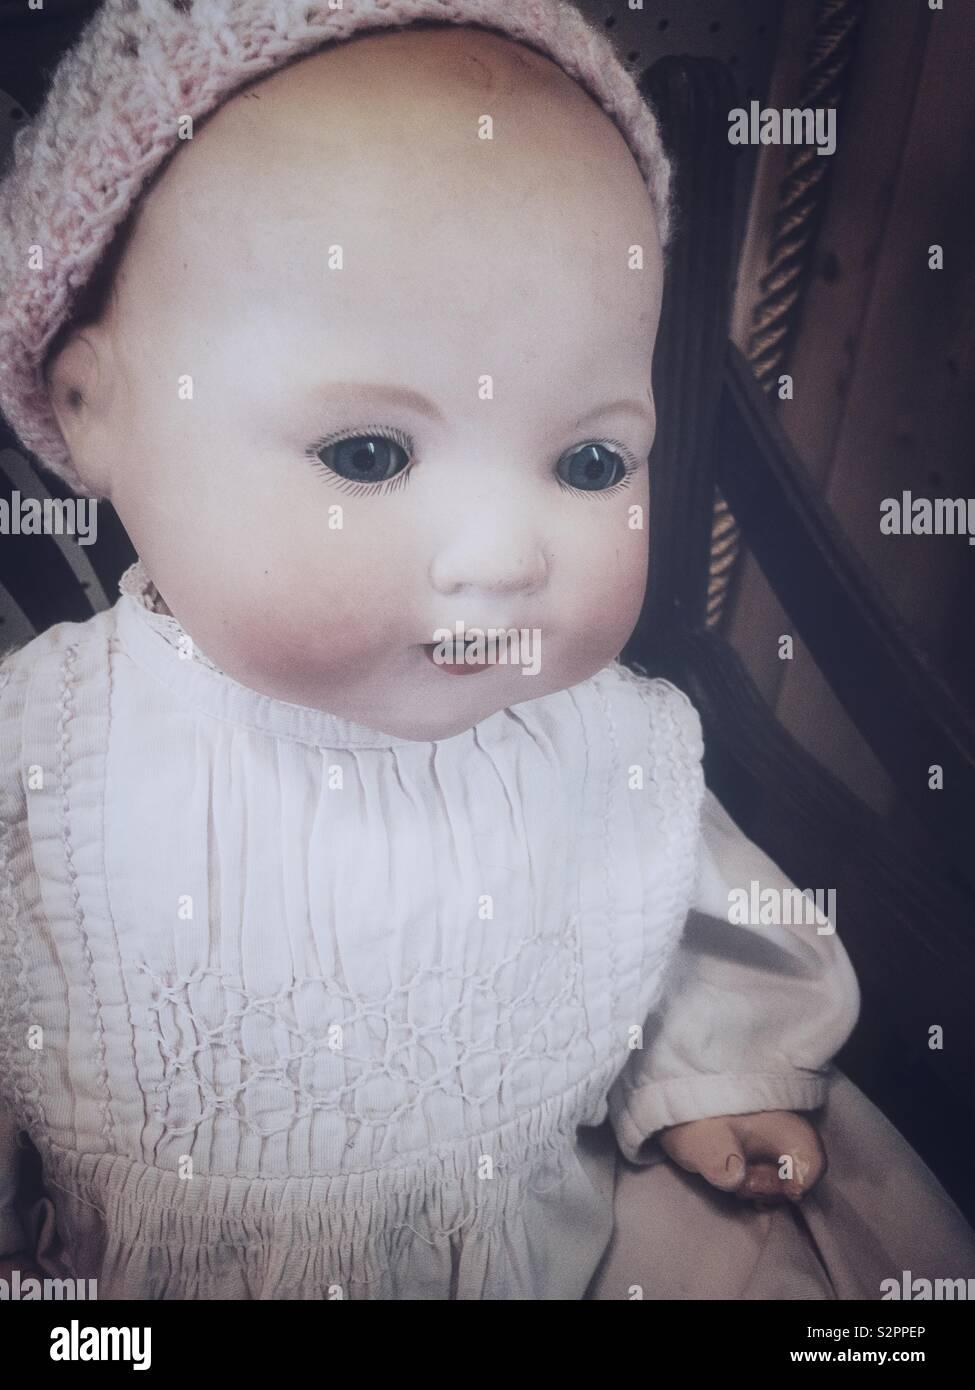 Das alte Kind Puppe. Stockbild